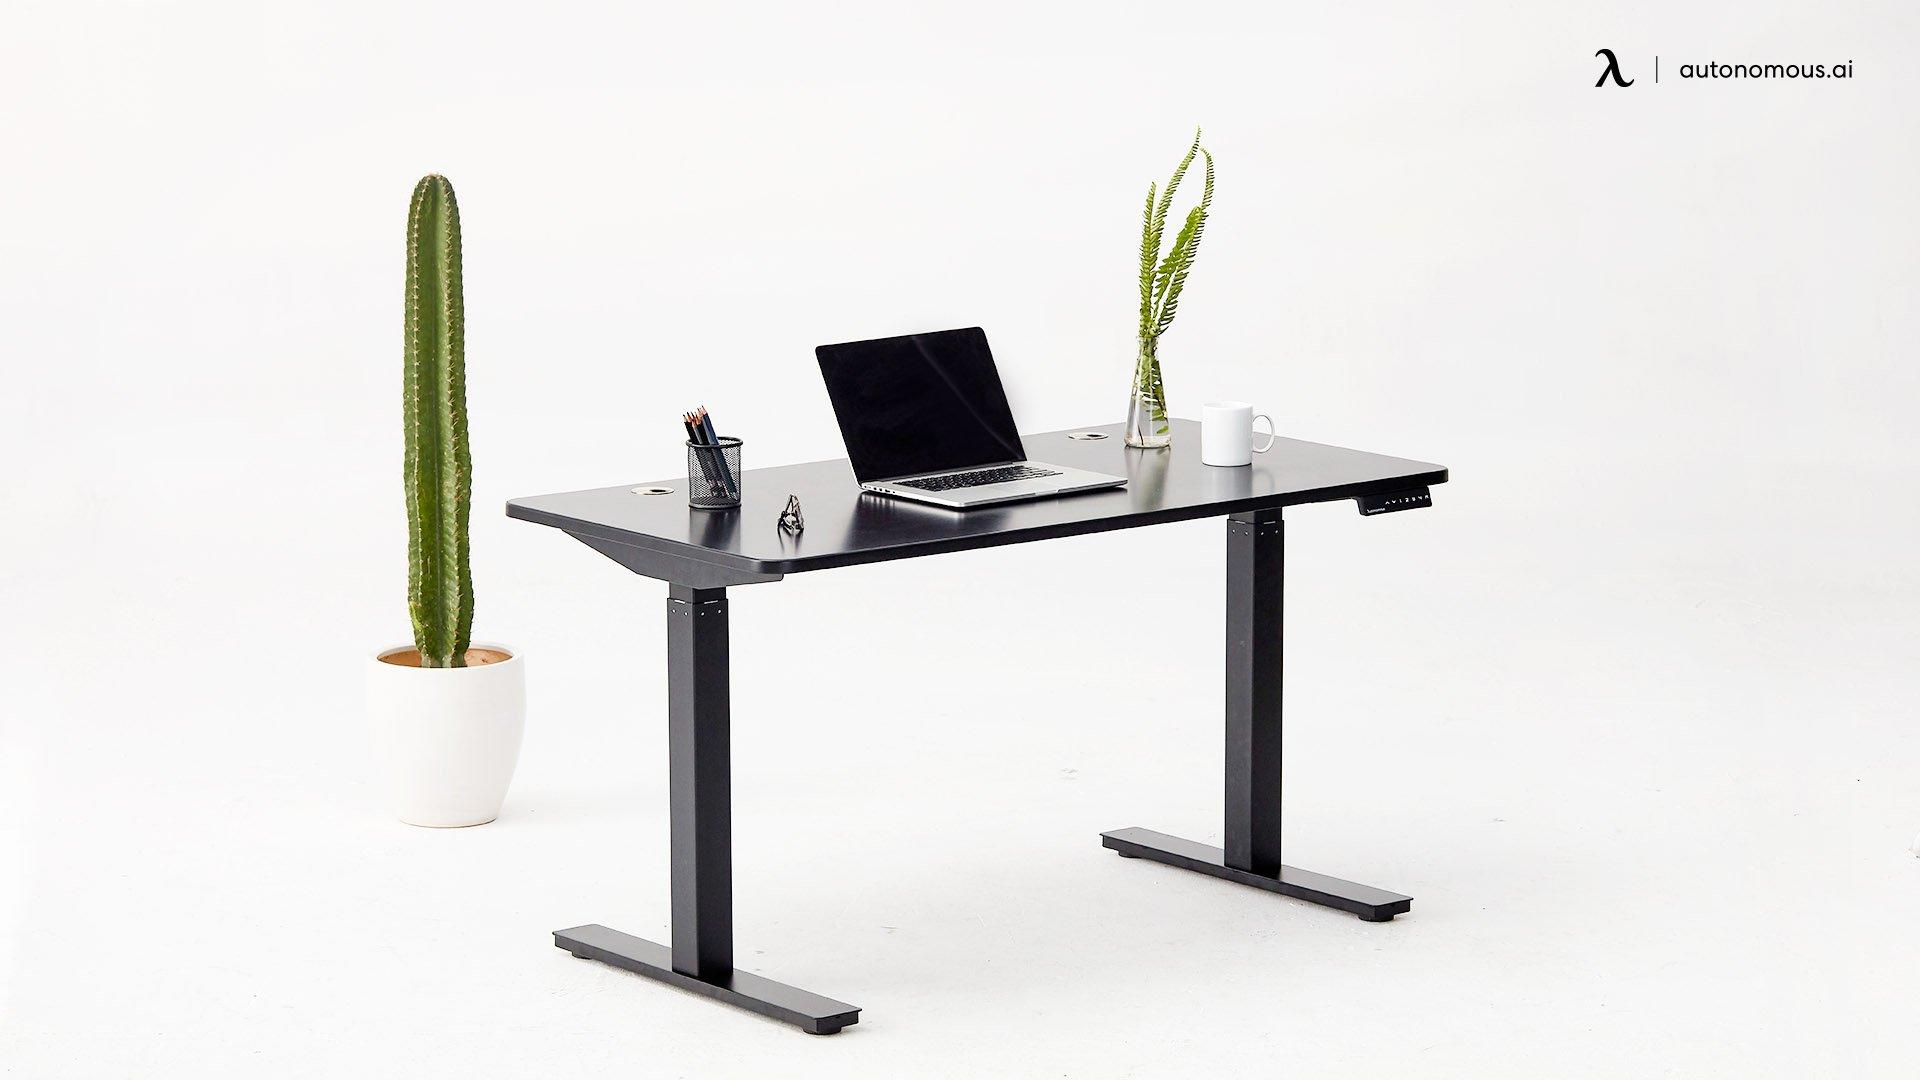 Autonomous SmartDesk 2 Home Office